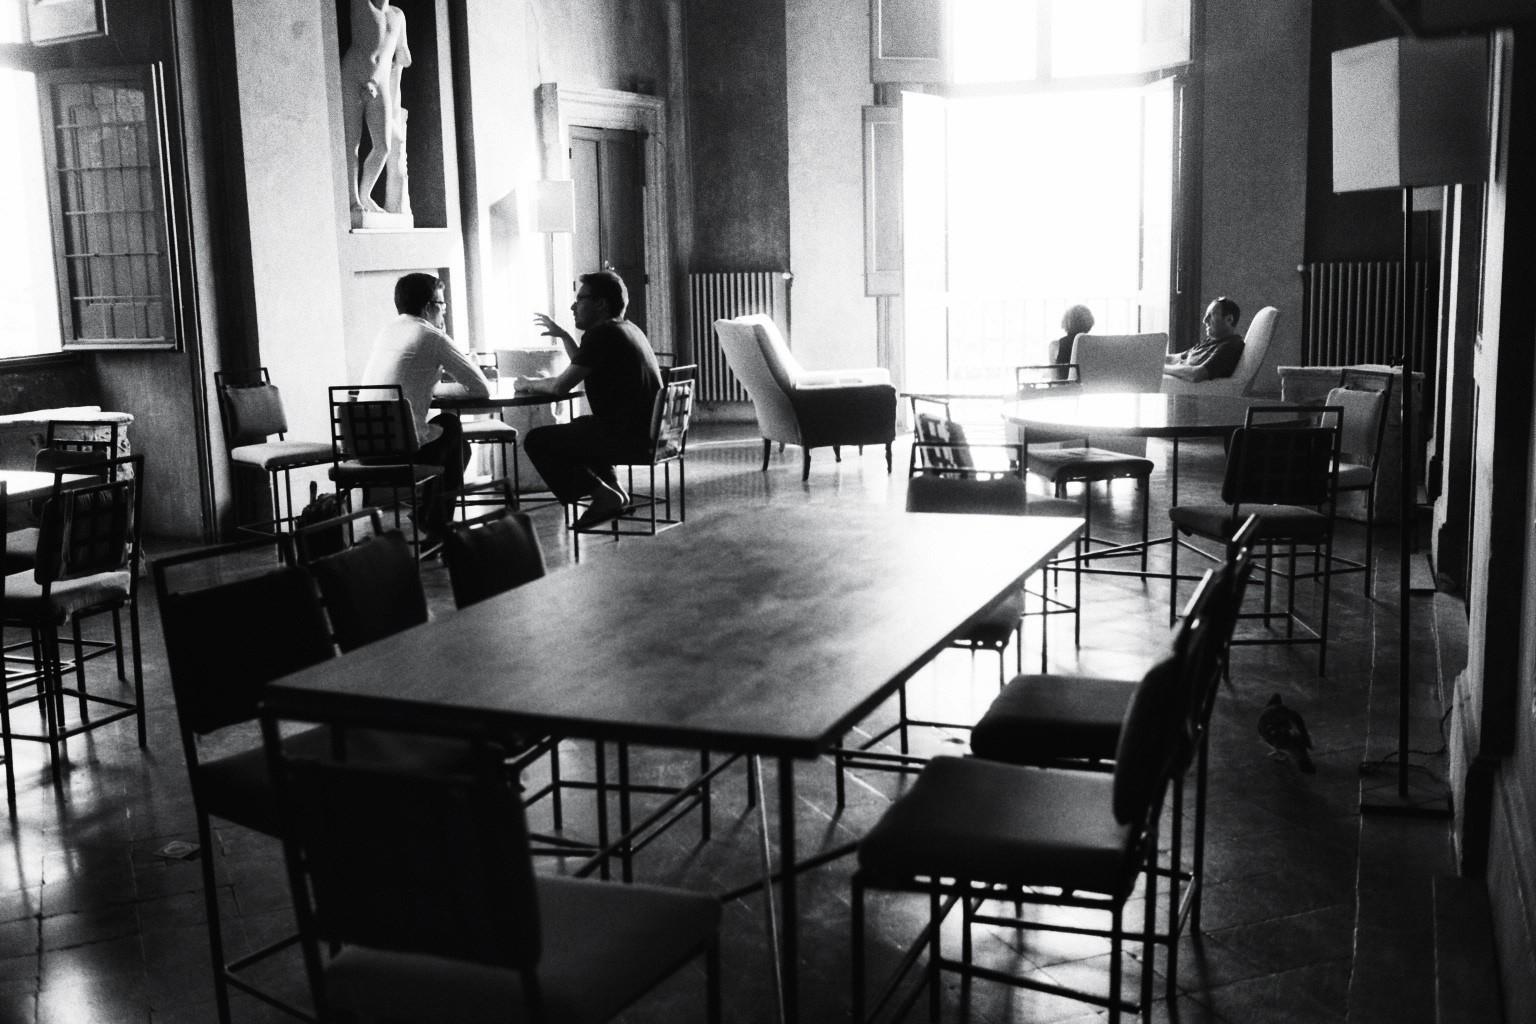 Le salon de thé de la villa de Medicis